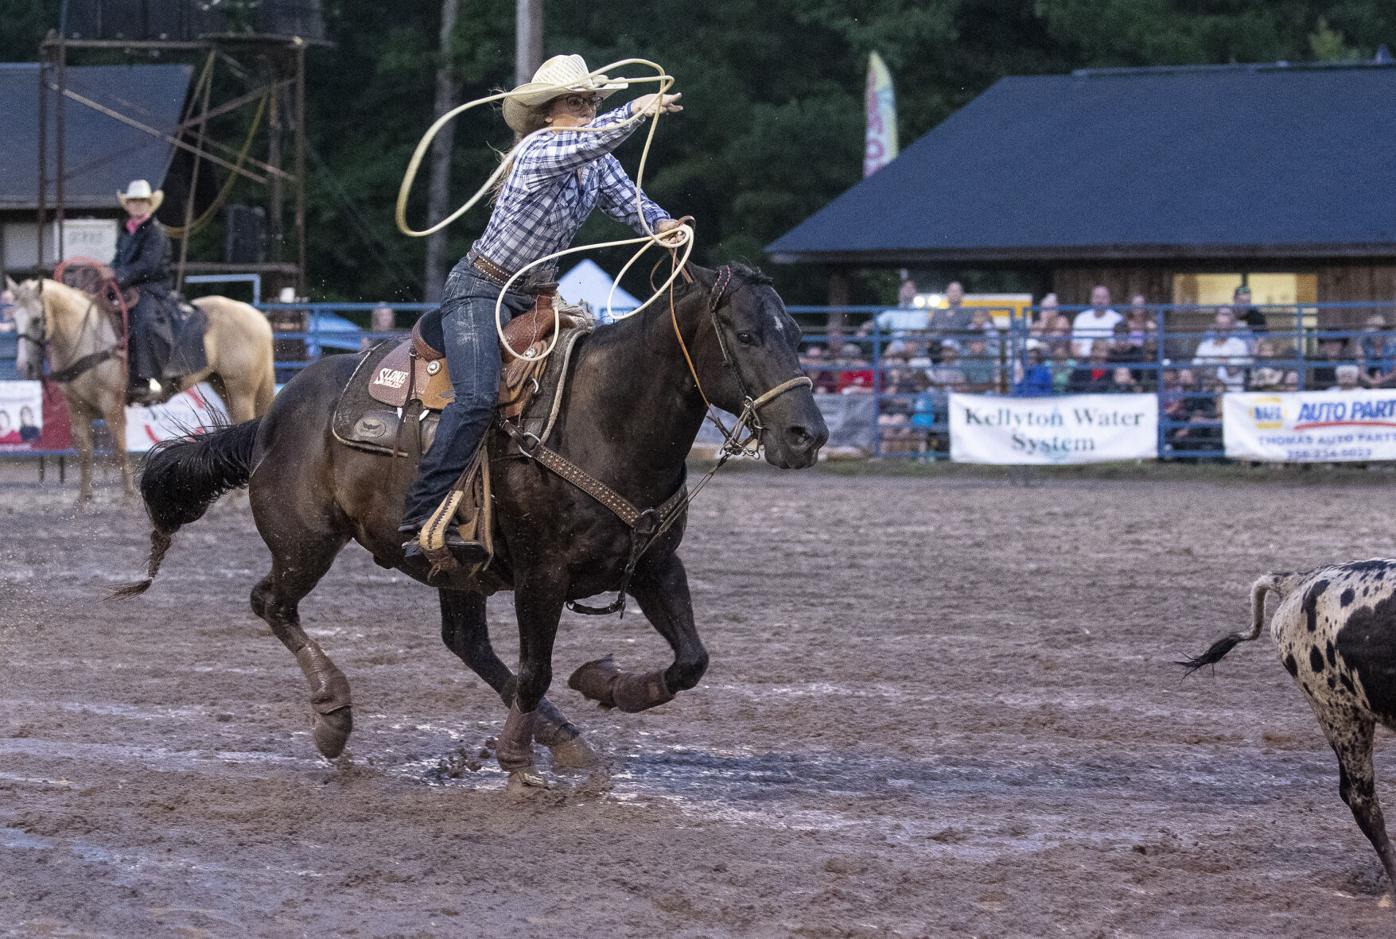 20210710 Rodeo001.jpg